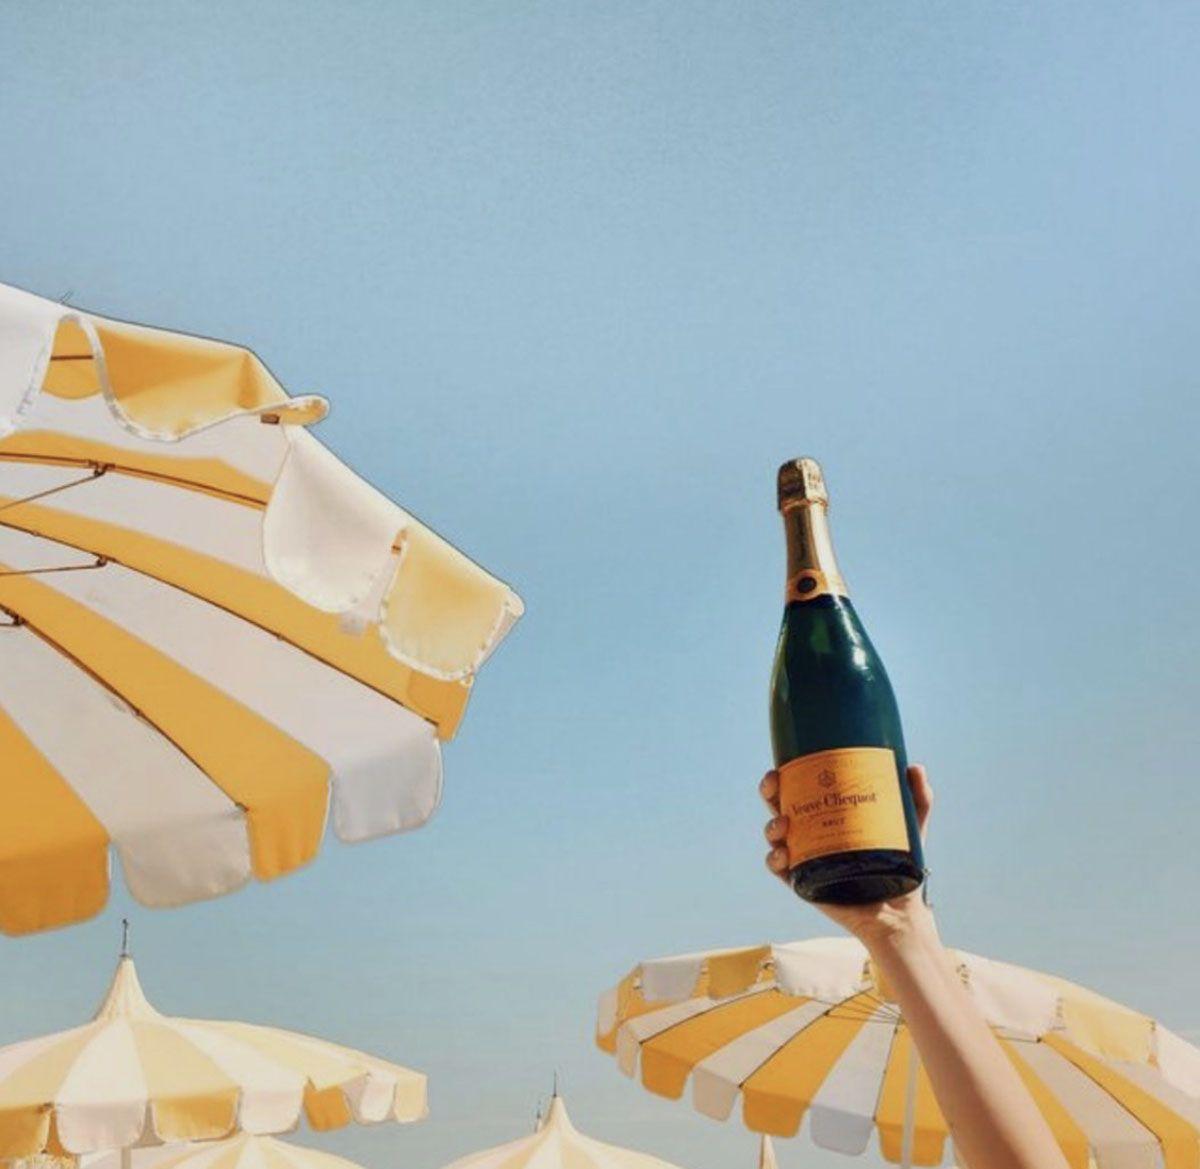 Beach Club White and Yellow Striped Umbrellas